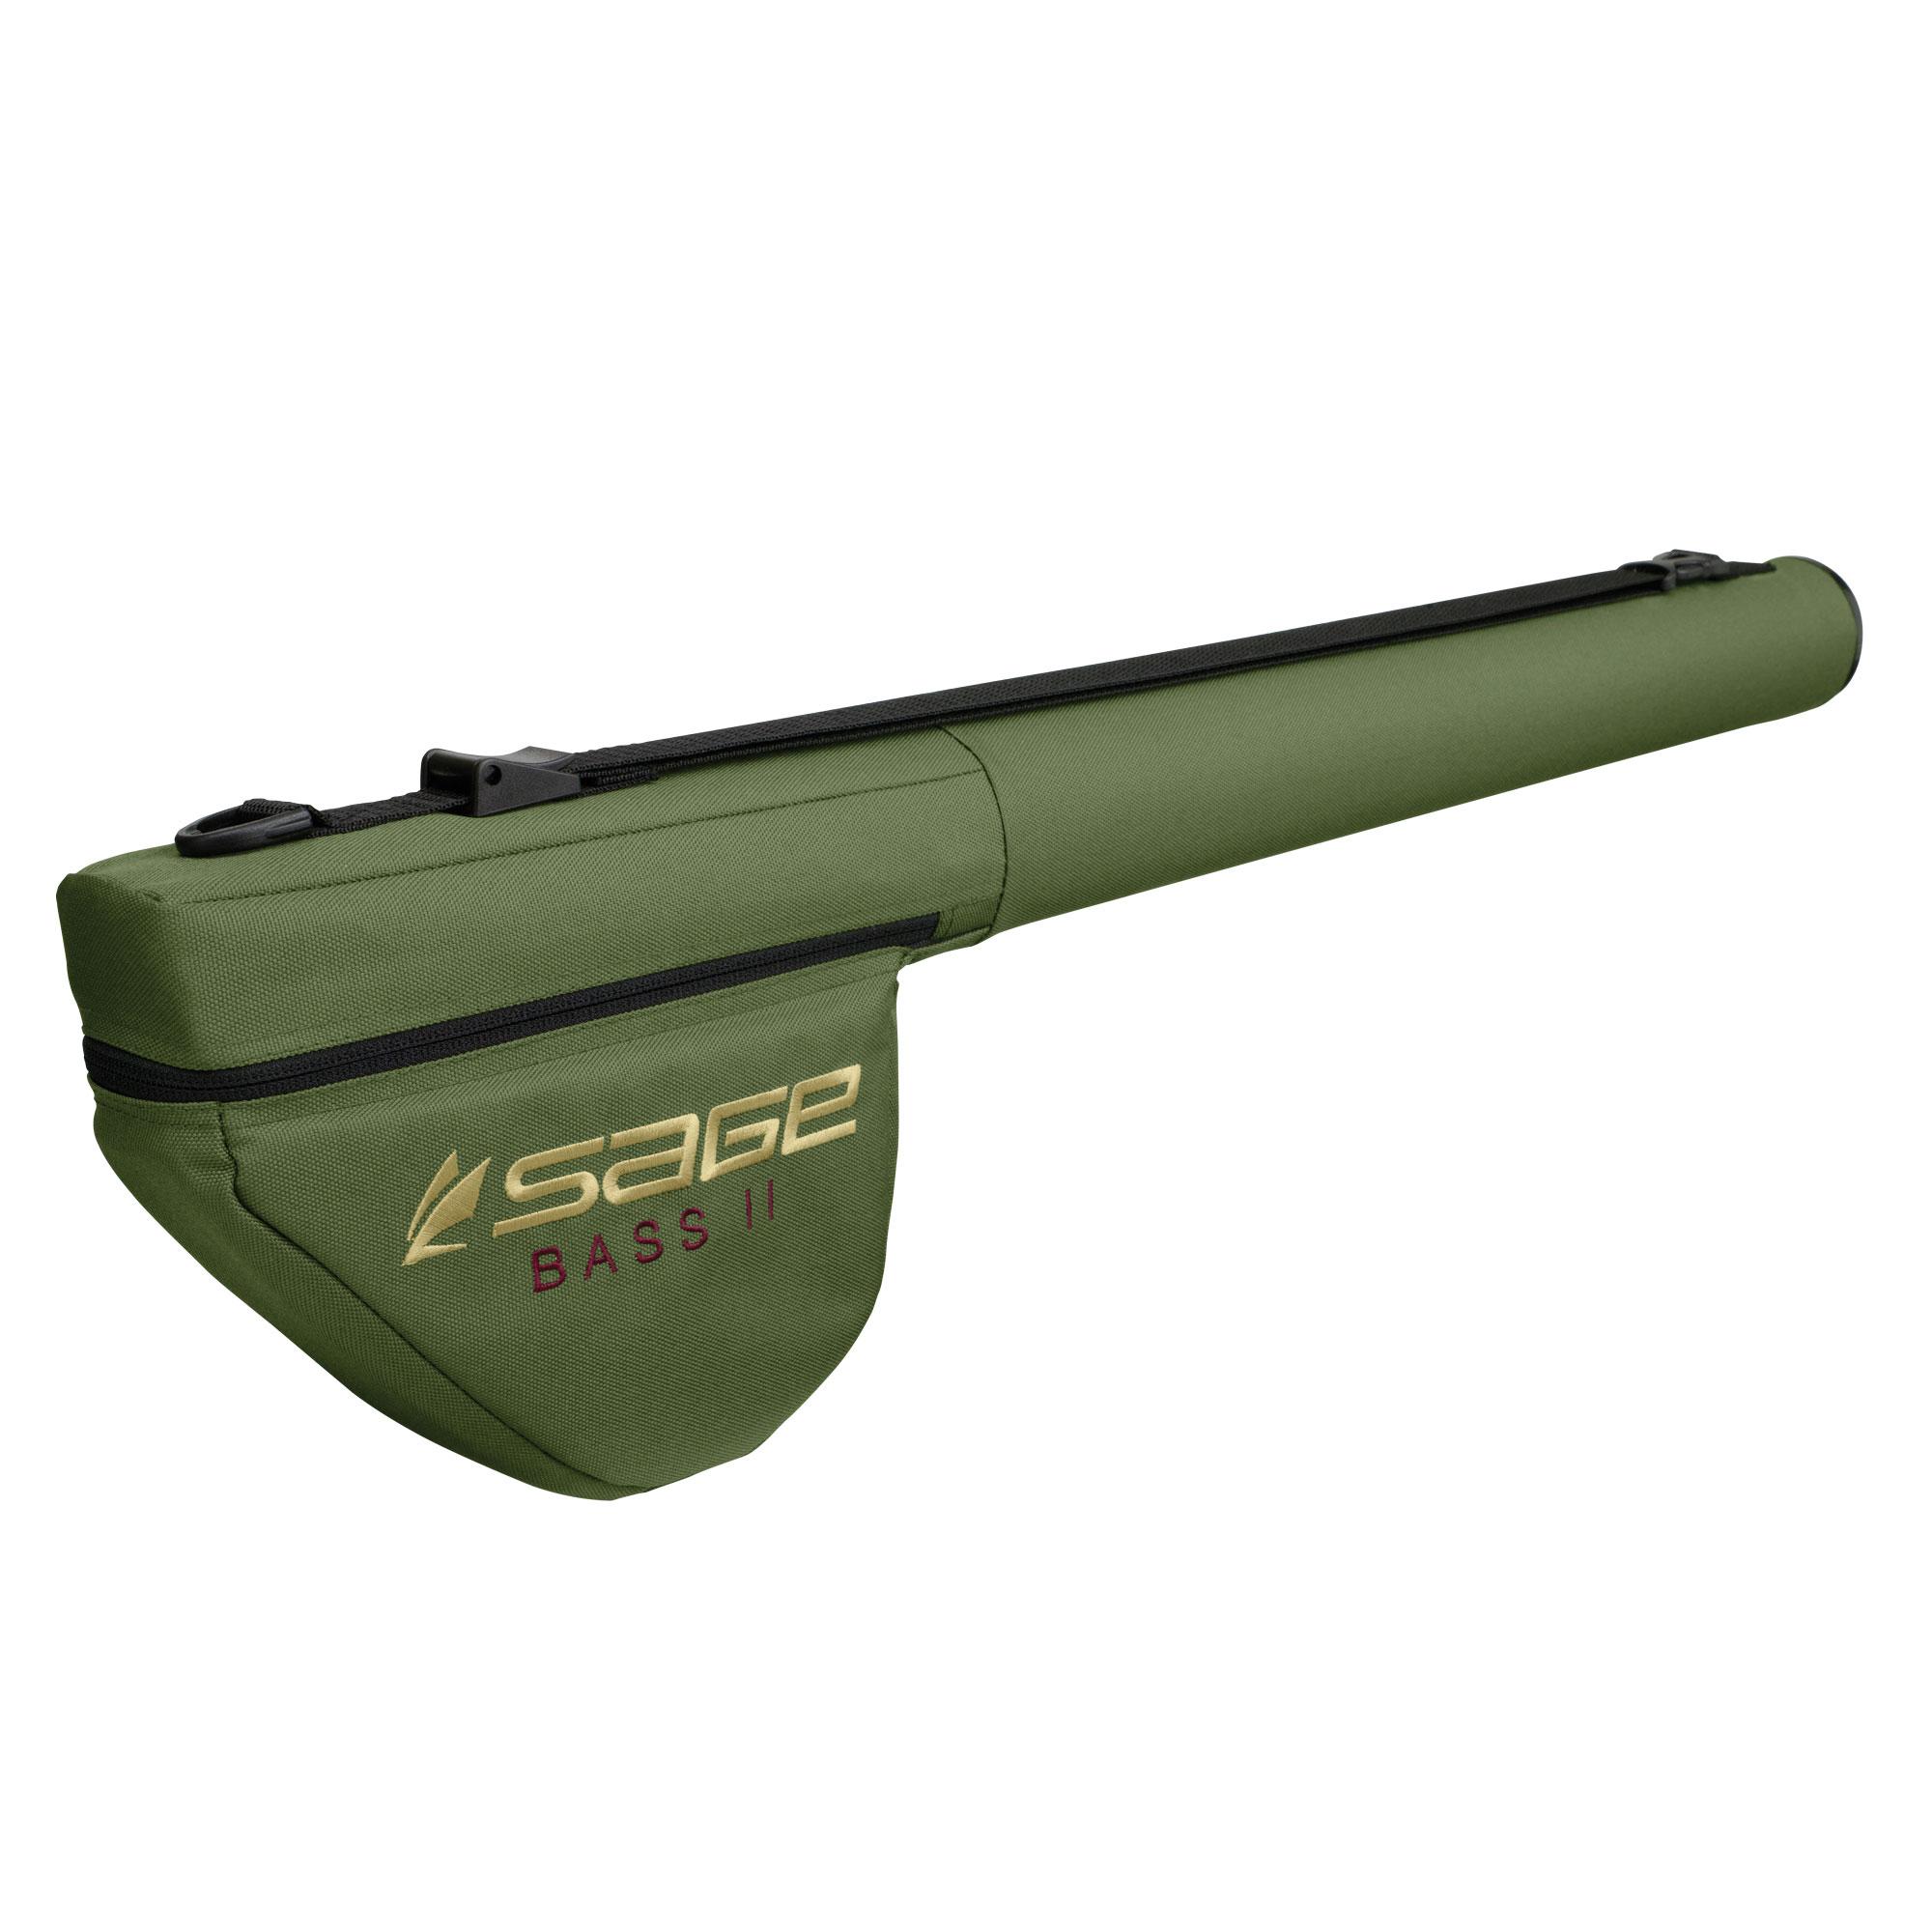 Sage Bass II